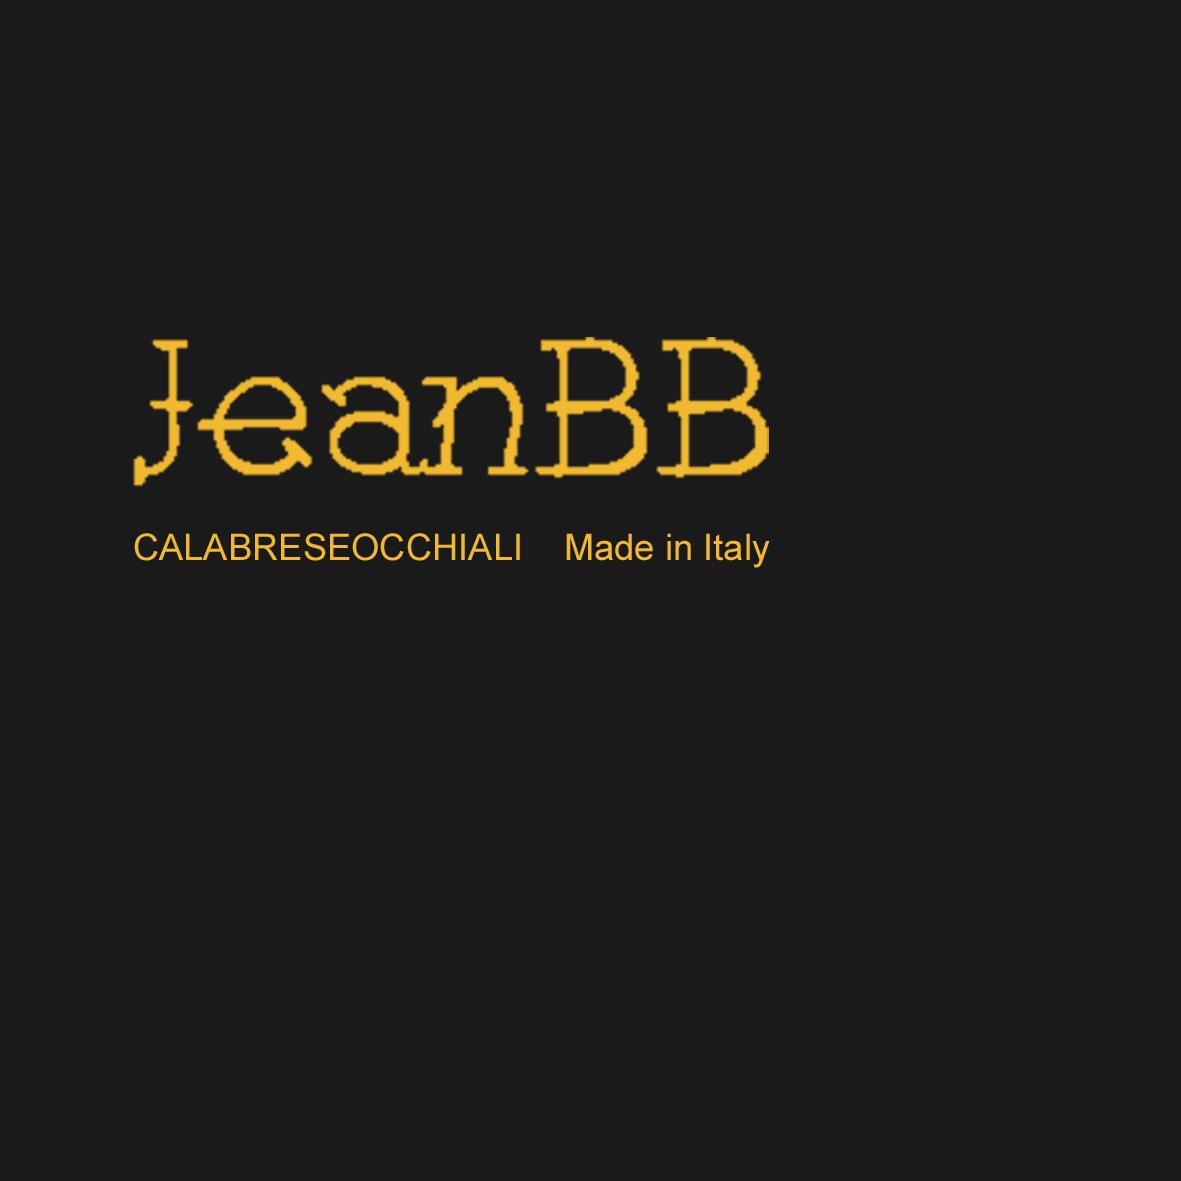 JEANBB CALABRESEOCCHIALI: OCCHIALERIA ARTIGIANALE MADE IN ITALY A BOLOGNA E SAN LAZZARO DI SAVENA